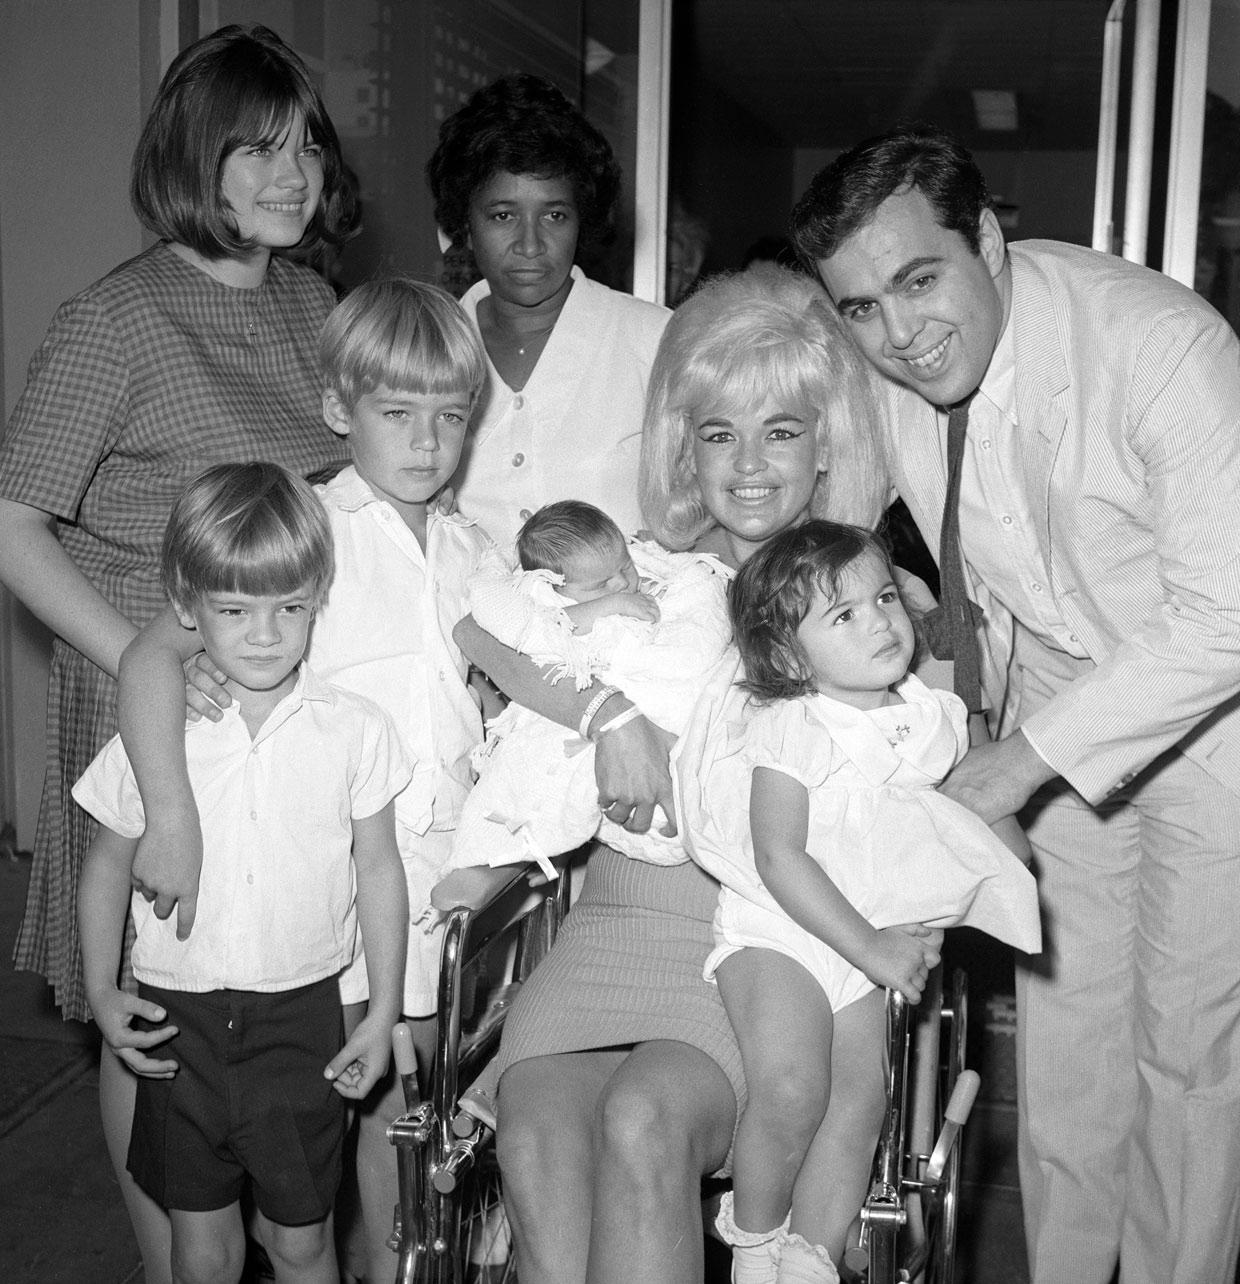 jayne-1965-10-21-LA-cedars_lebanon_hospital-baby_anthony-1